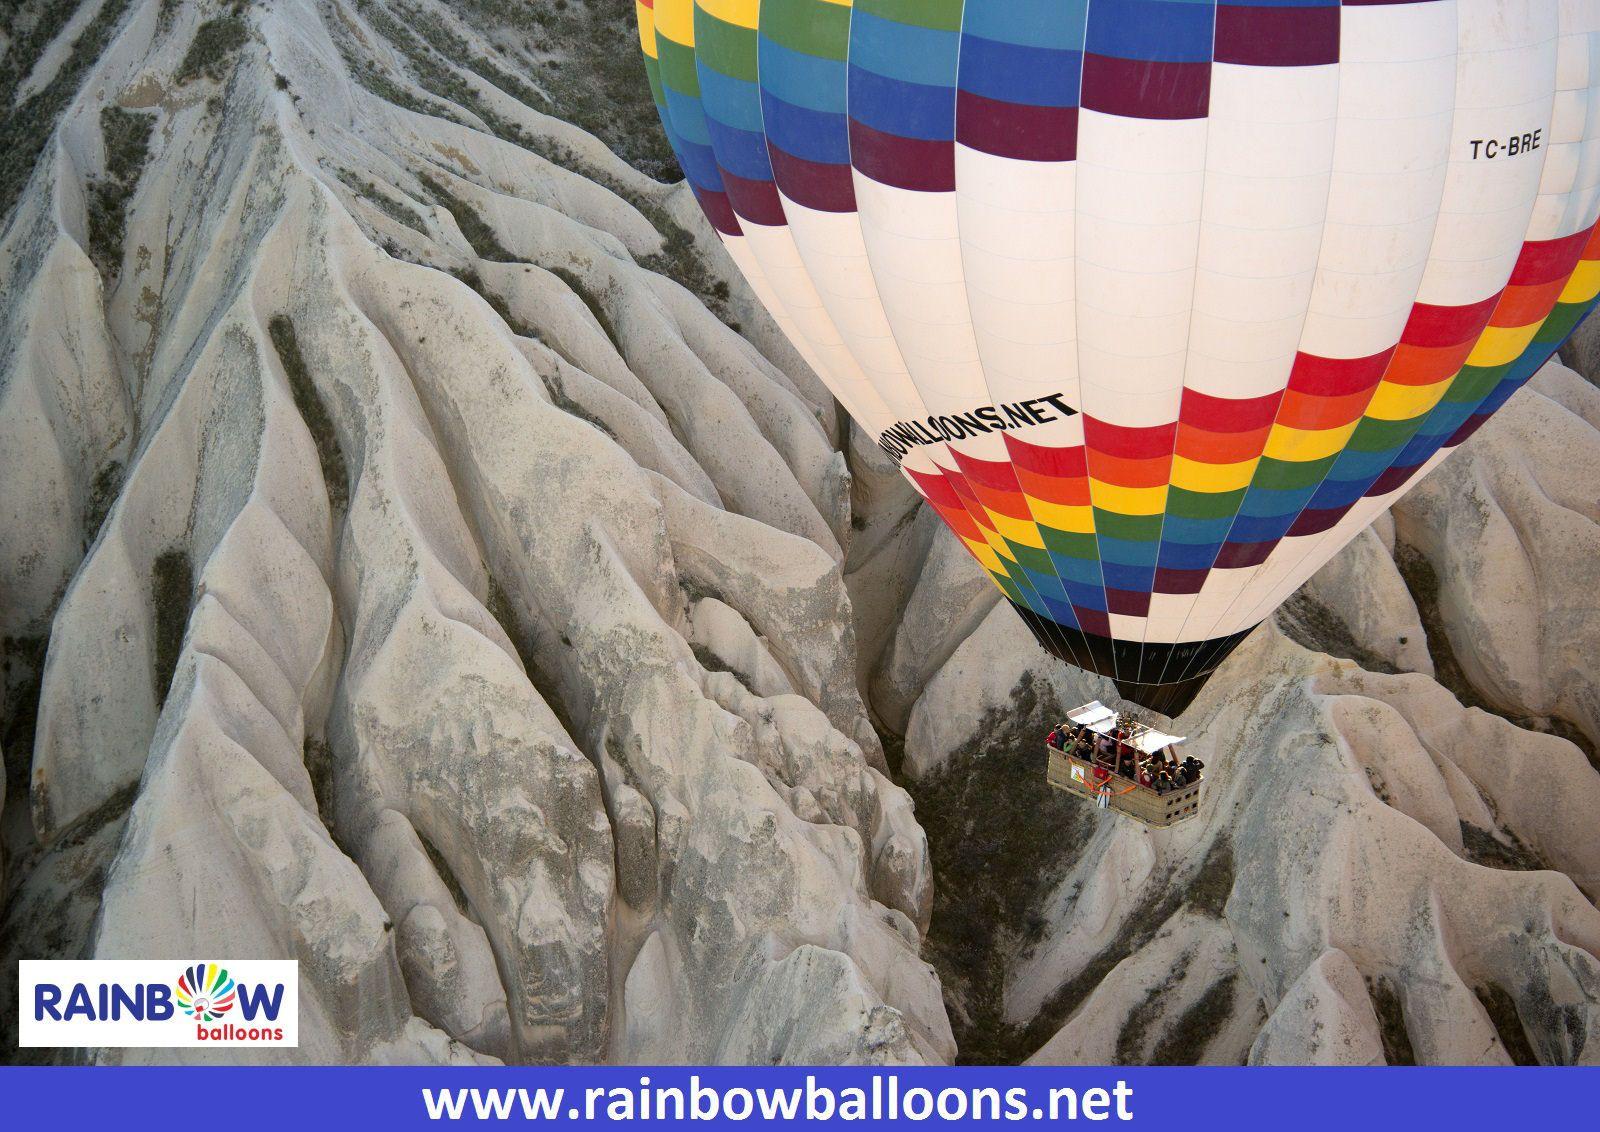 www.rainbowballoo… #Rainbowballoons #Balloon #Hotair #Cappadocia #Morning #Tur…